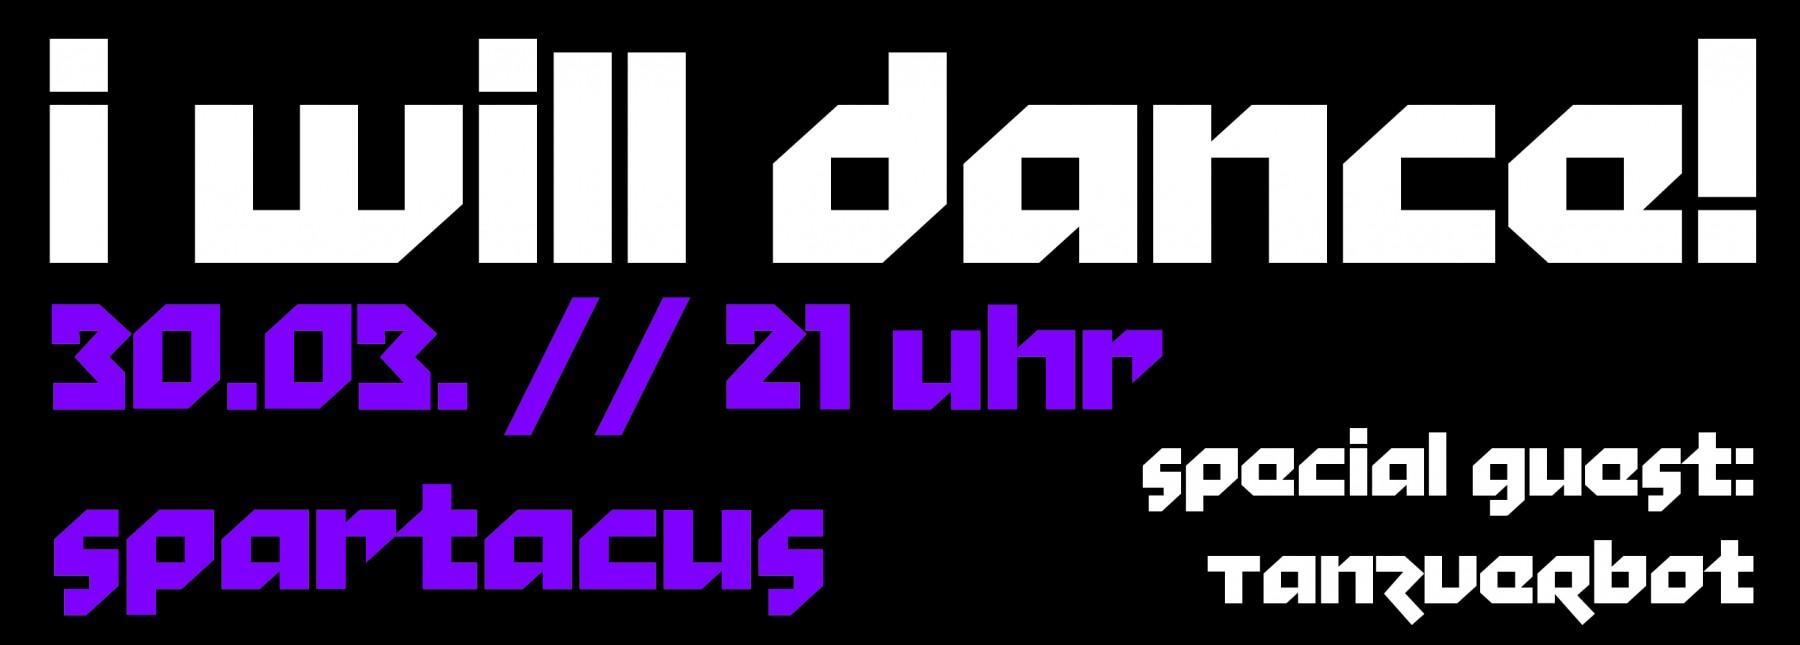 I will dance! - Kneipenabend mit Tanzmusik